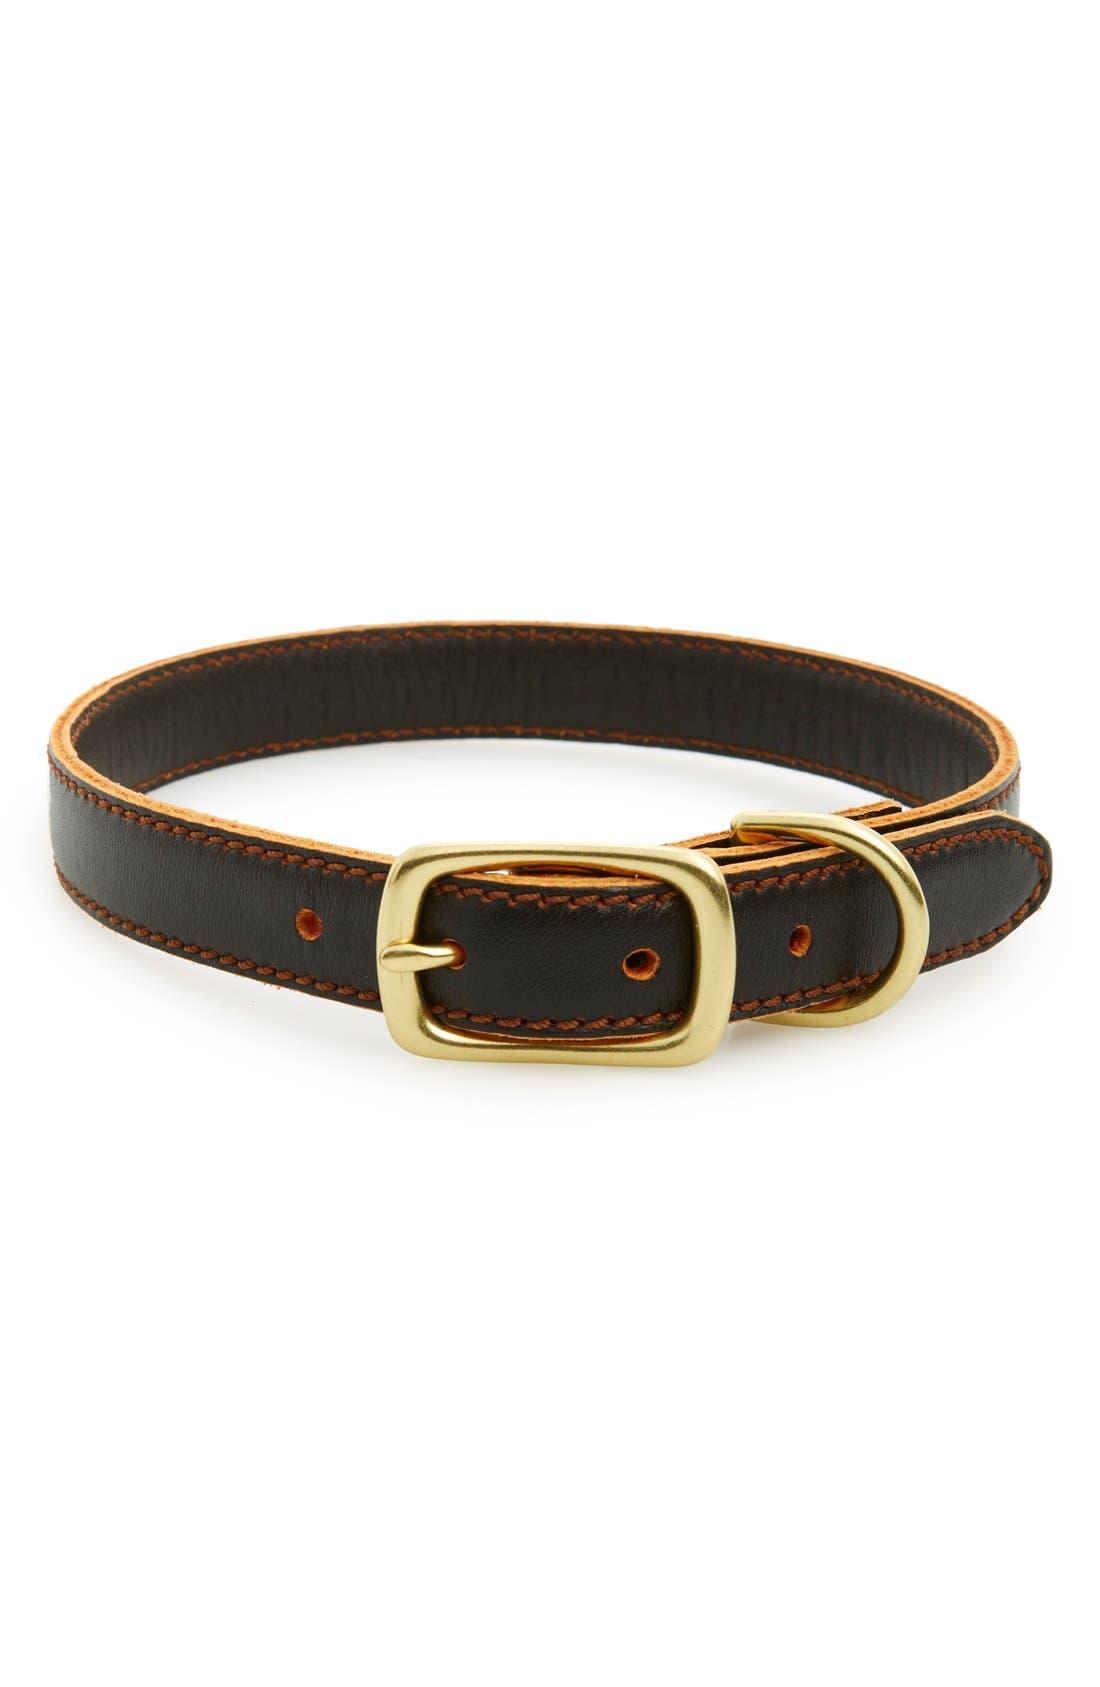 Leather Dog Collar,                             Main thumbnail 1, color,                             200